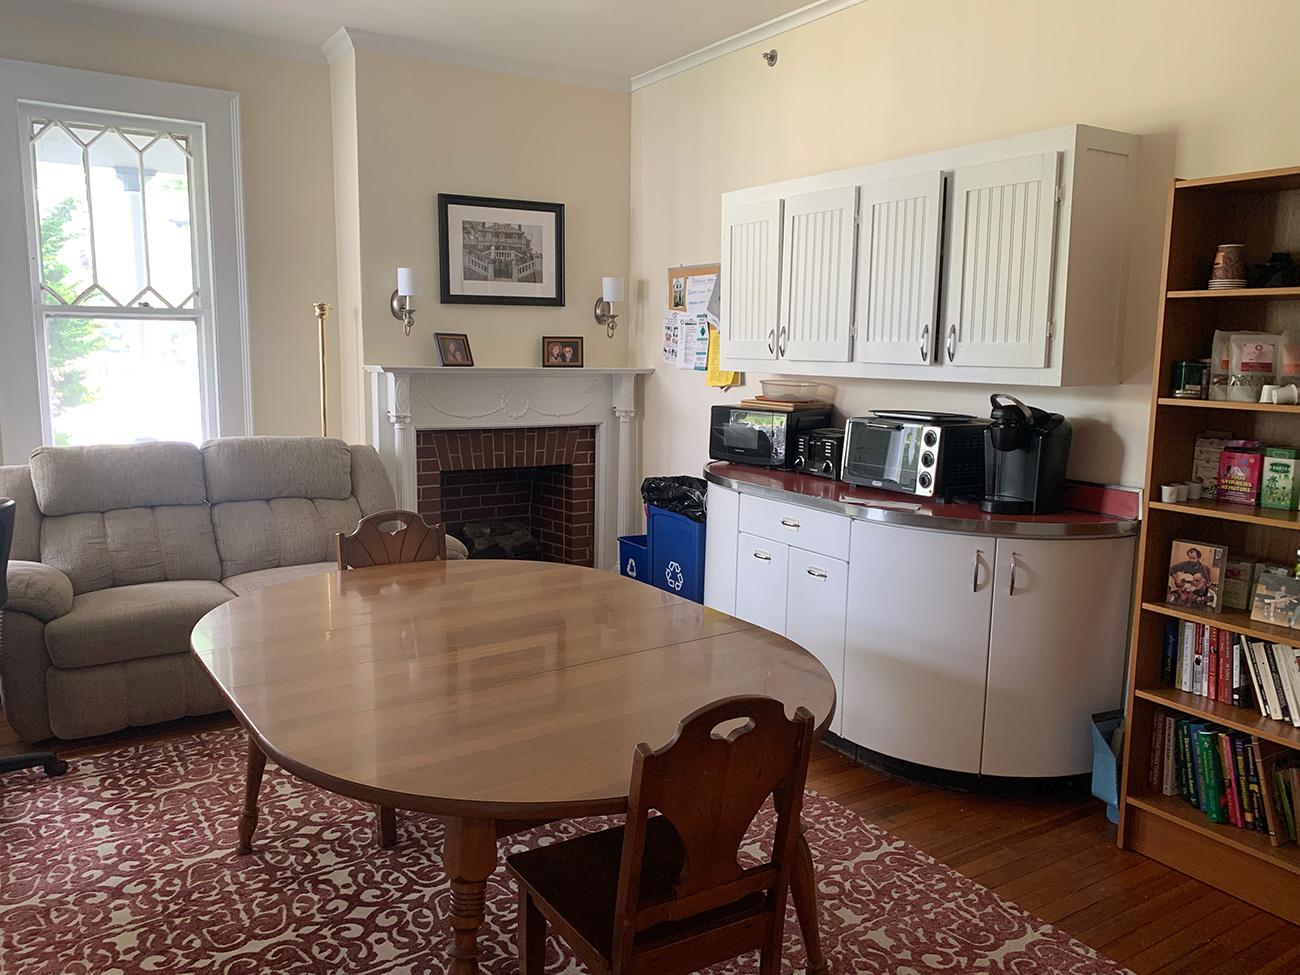 HFI Interior, kitchen